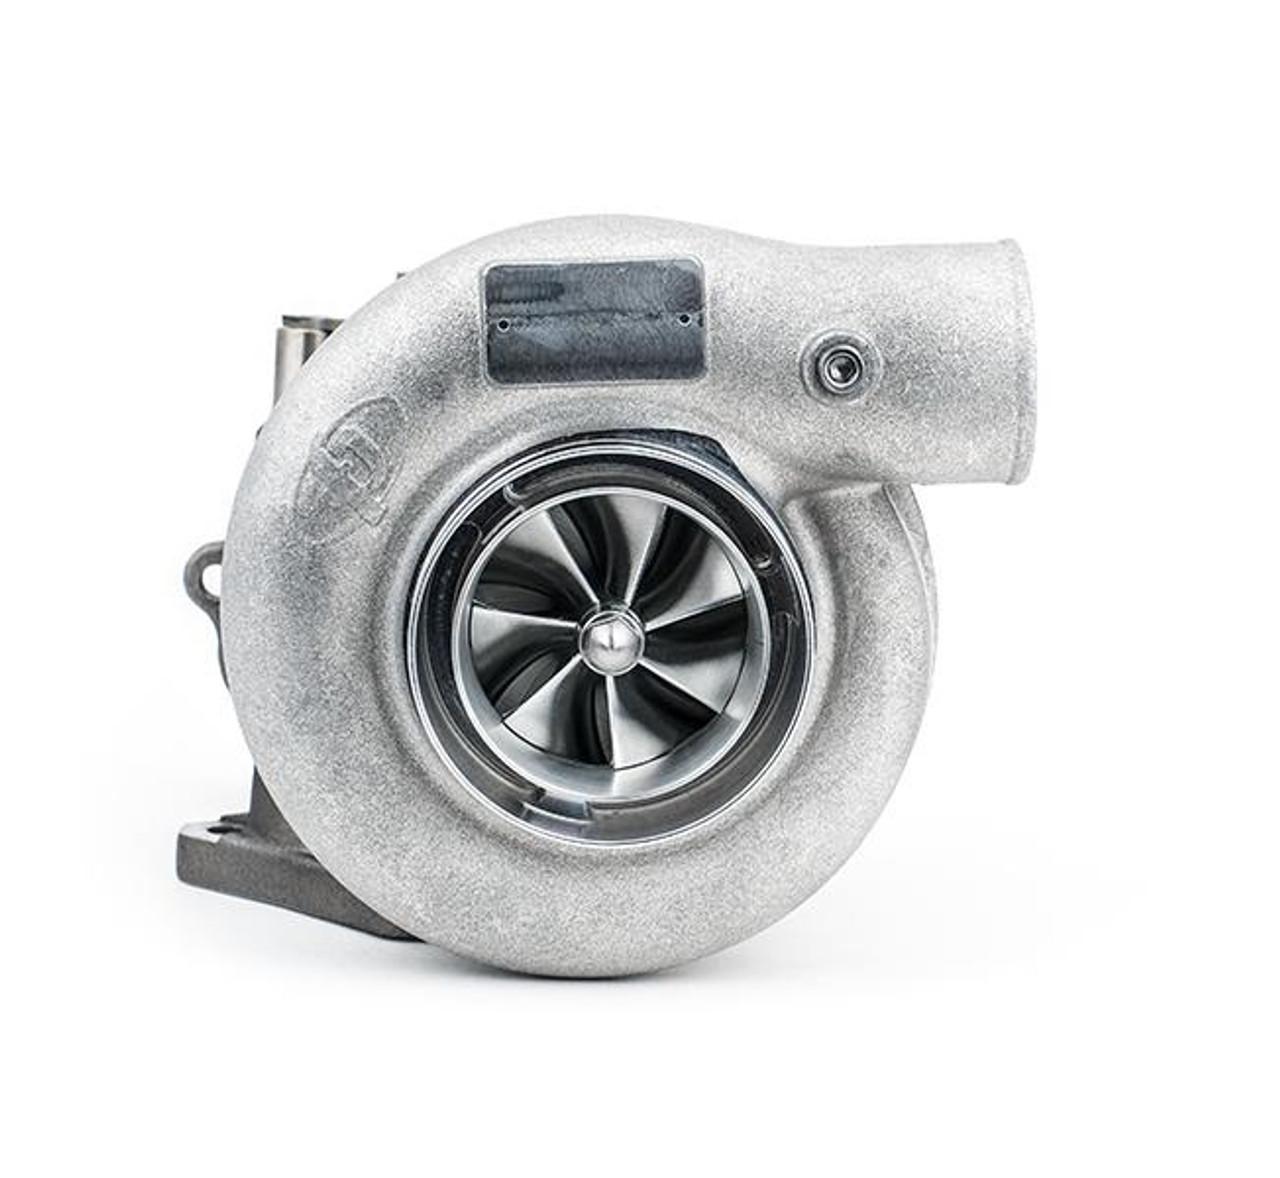 Forced Performance XR Black BB Turbocharger For 02-21 Subaru WRX/STI - 2027060